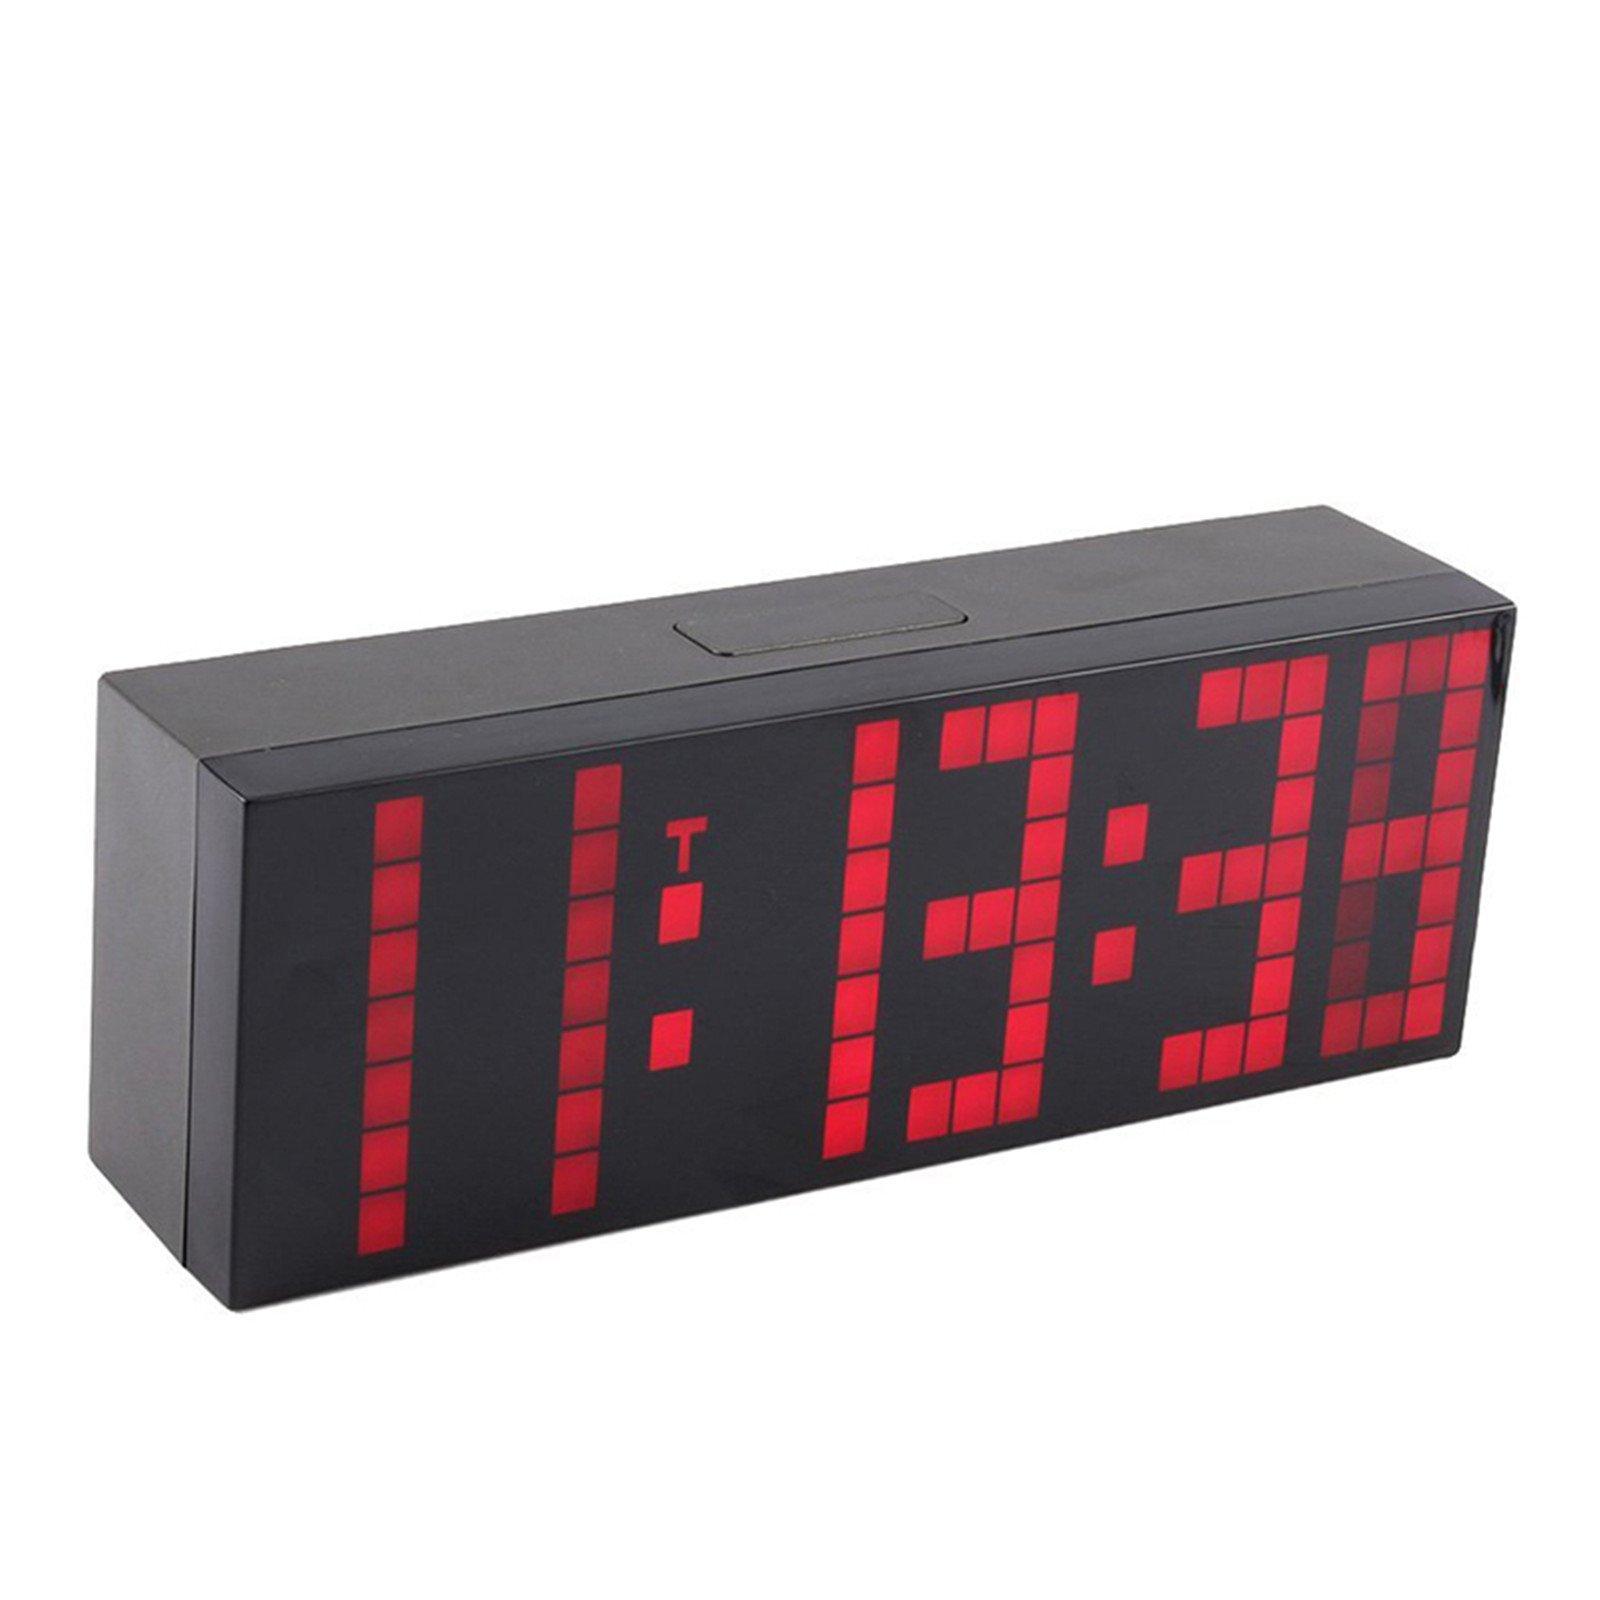 Denshine Lattice LED Digital Alarm/Countdown/up Clock